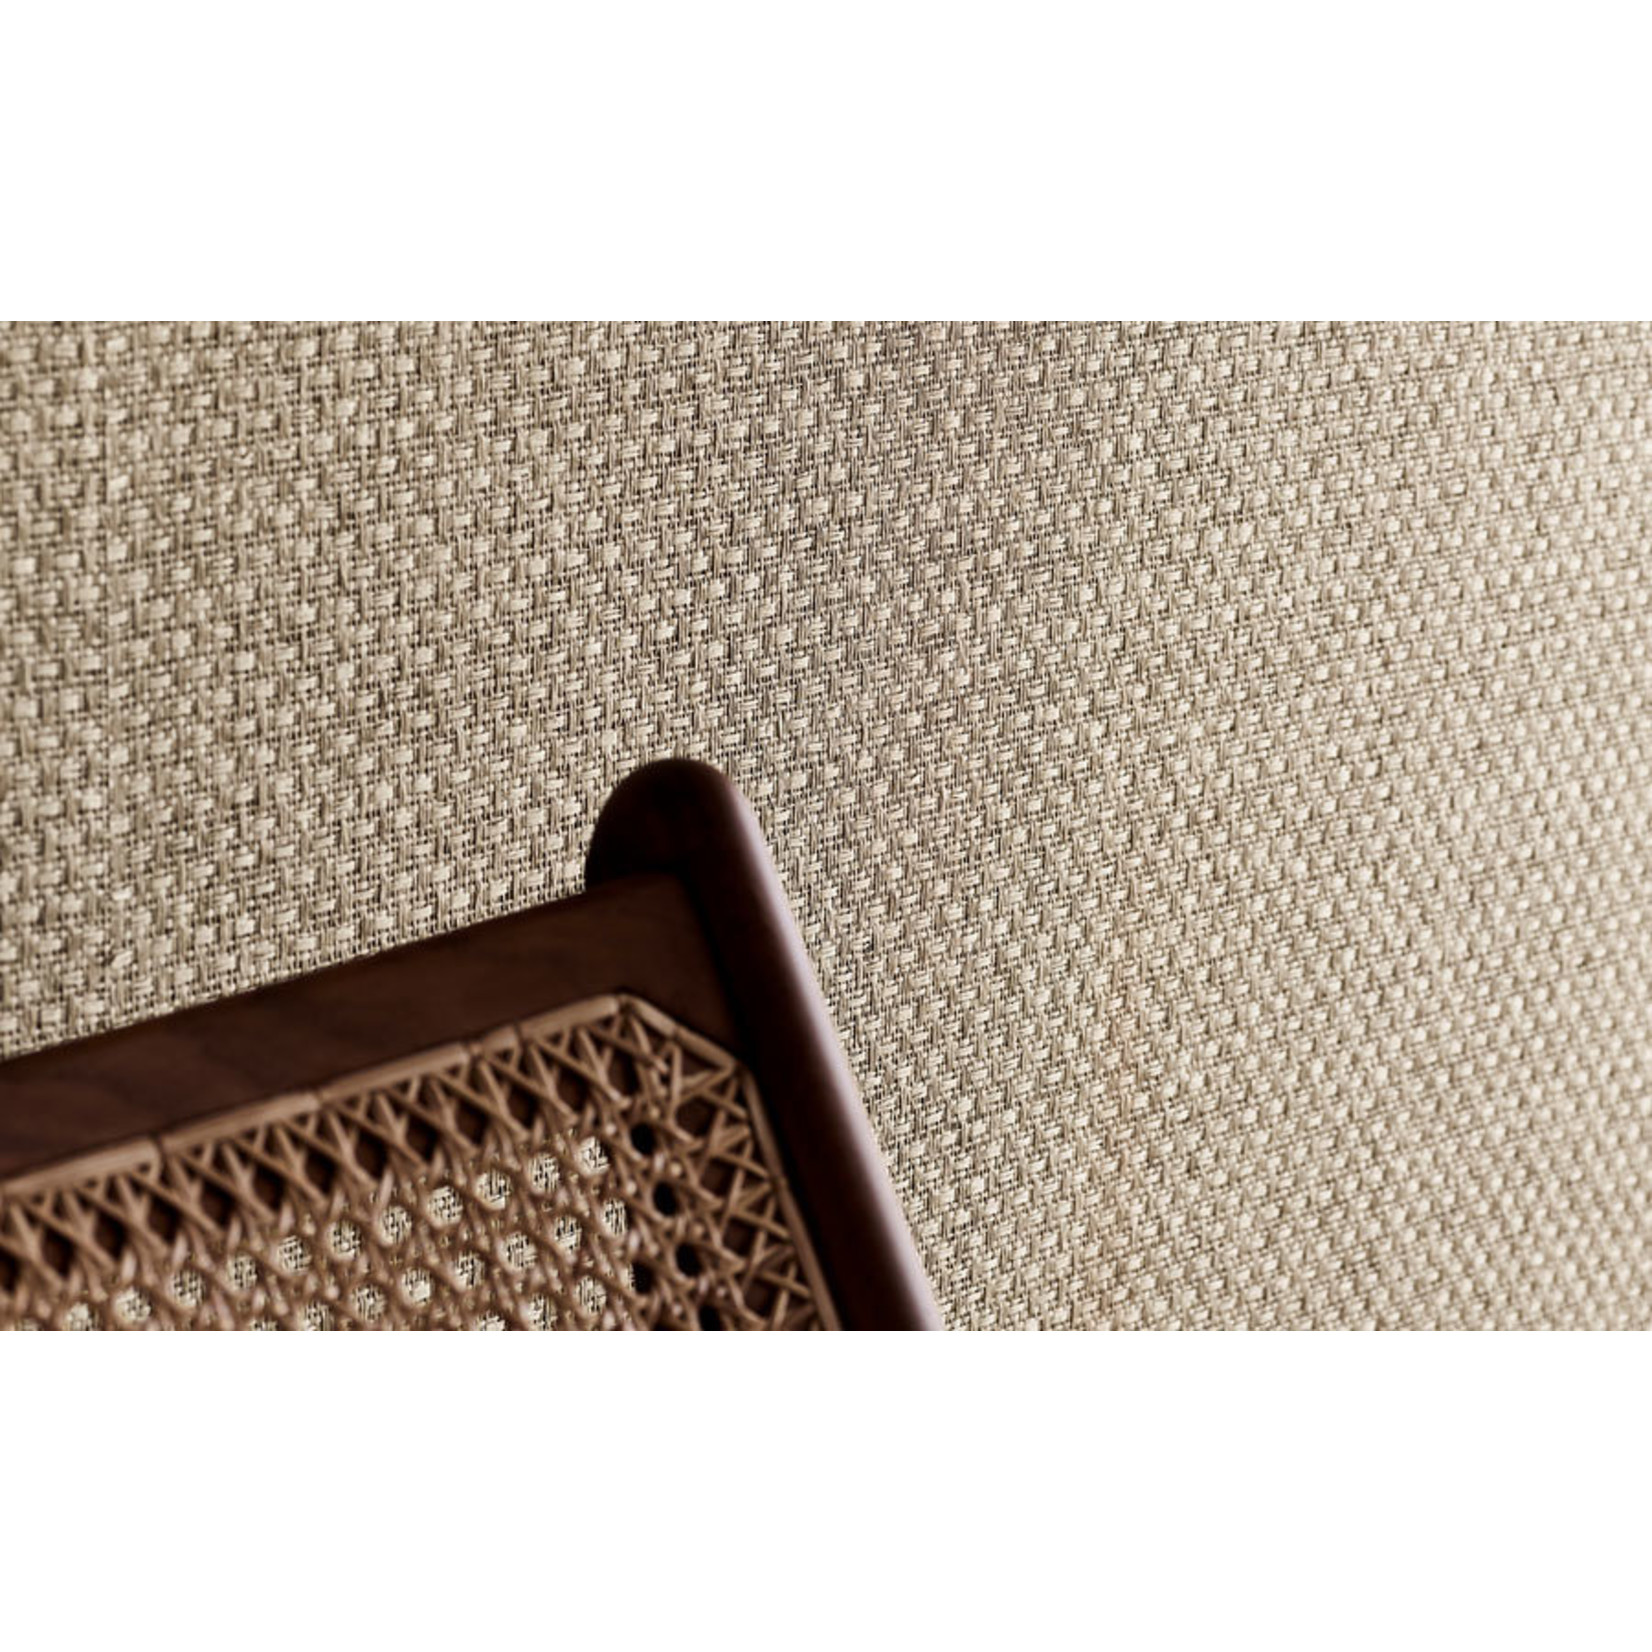 Mark Alexander Paperweave Handwoven Wallcoverings | Shifu Heath